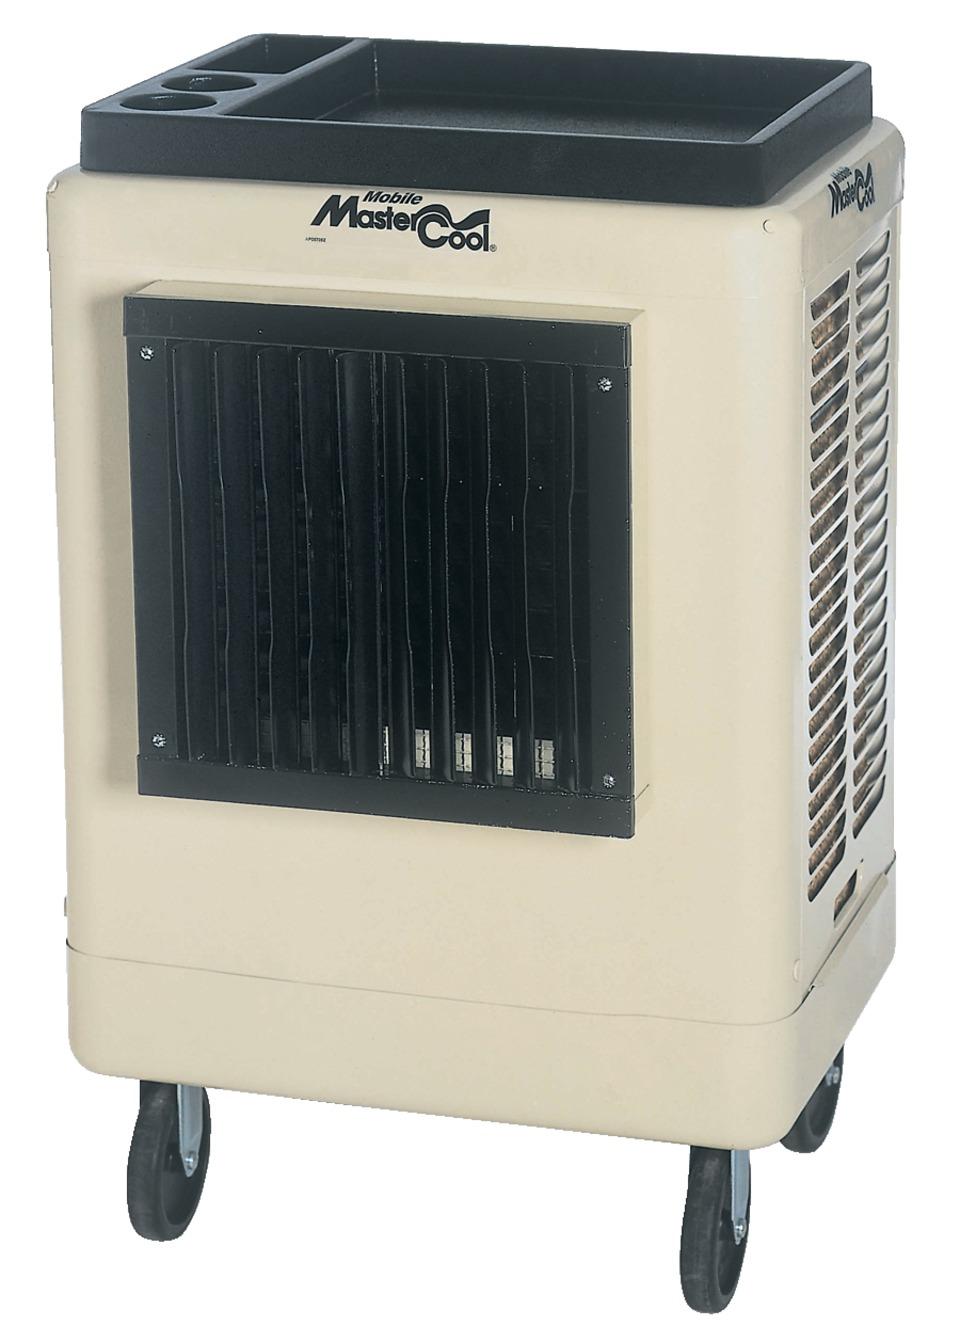 Mastercool 2 Evaporative Coolers : Mastercool inc models mmb evaporative coolers